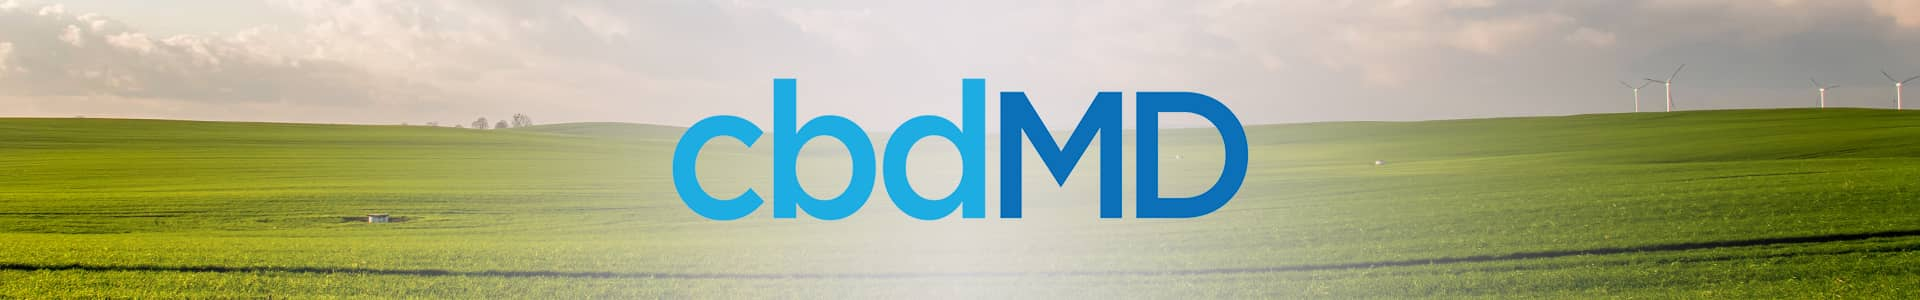 Buy CBDmd Online